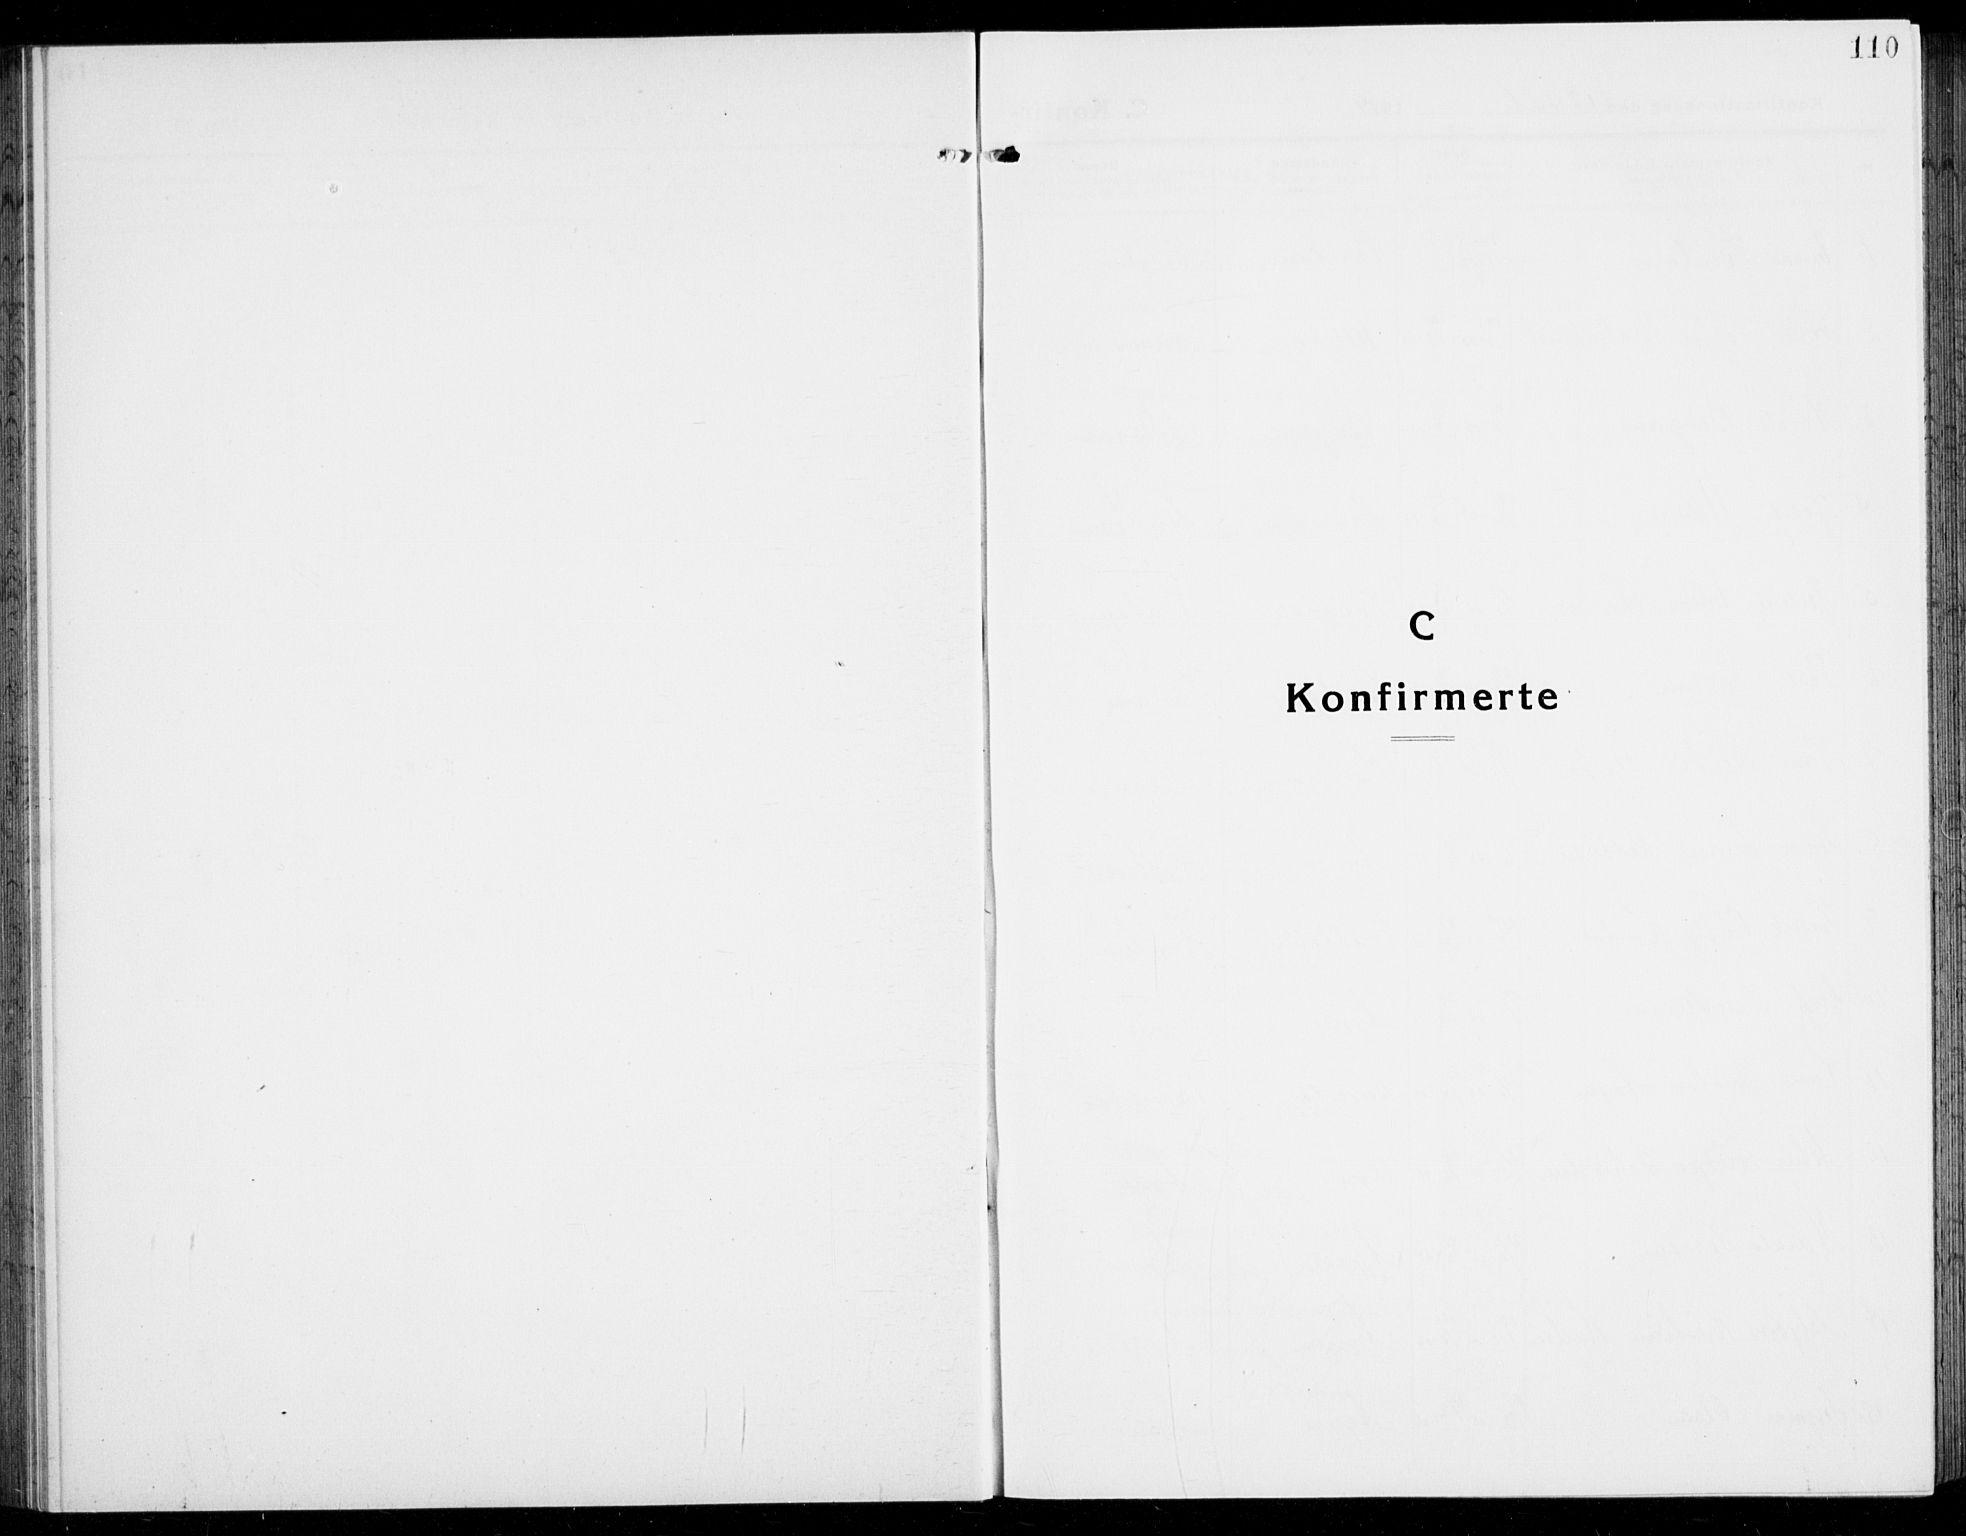 SAKO, Brunlanes kirkebøker, G/Ga/L0005: Klokkerbok nr. I 5, 1918-1941, s. 110